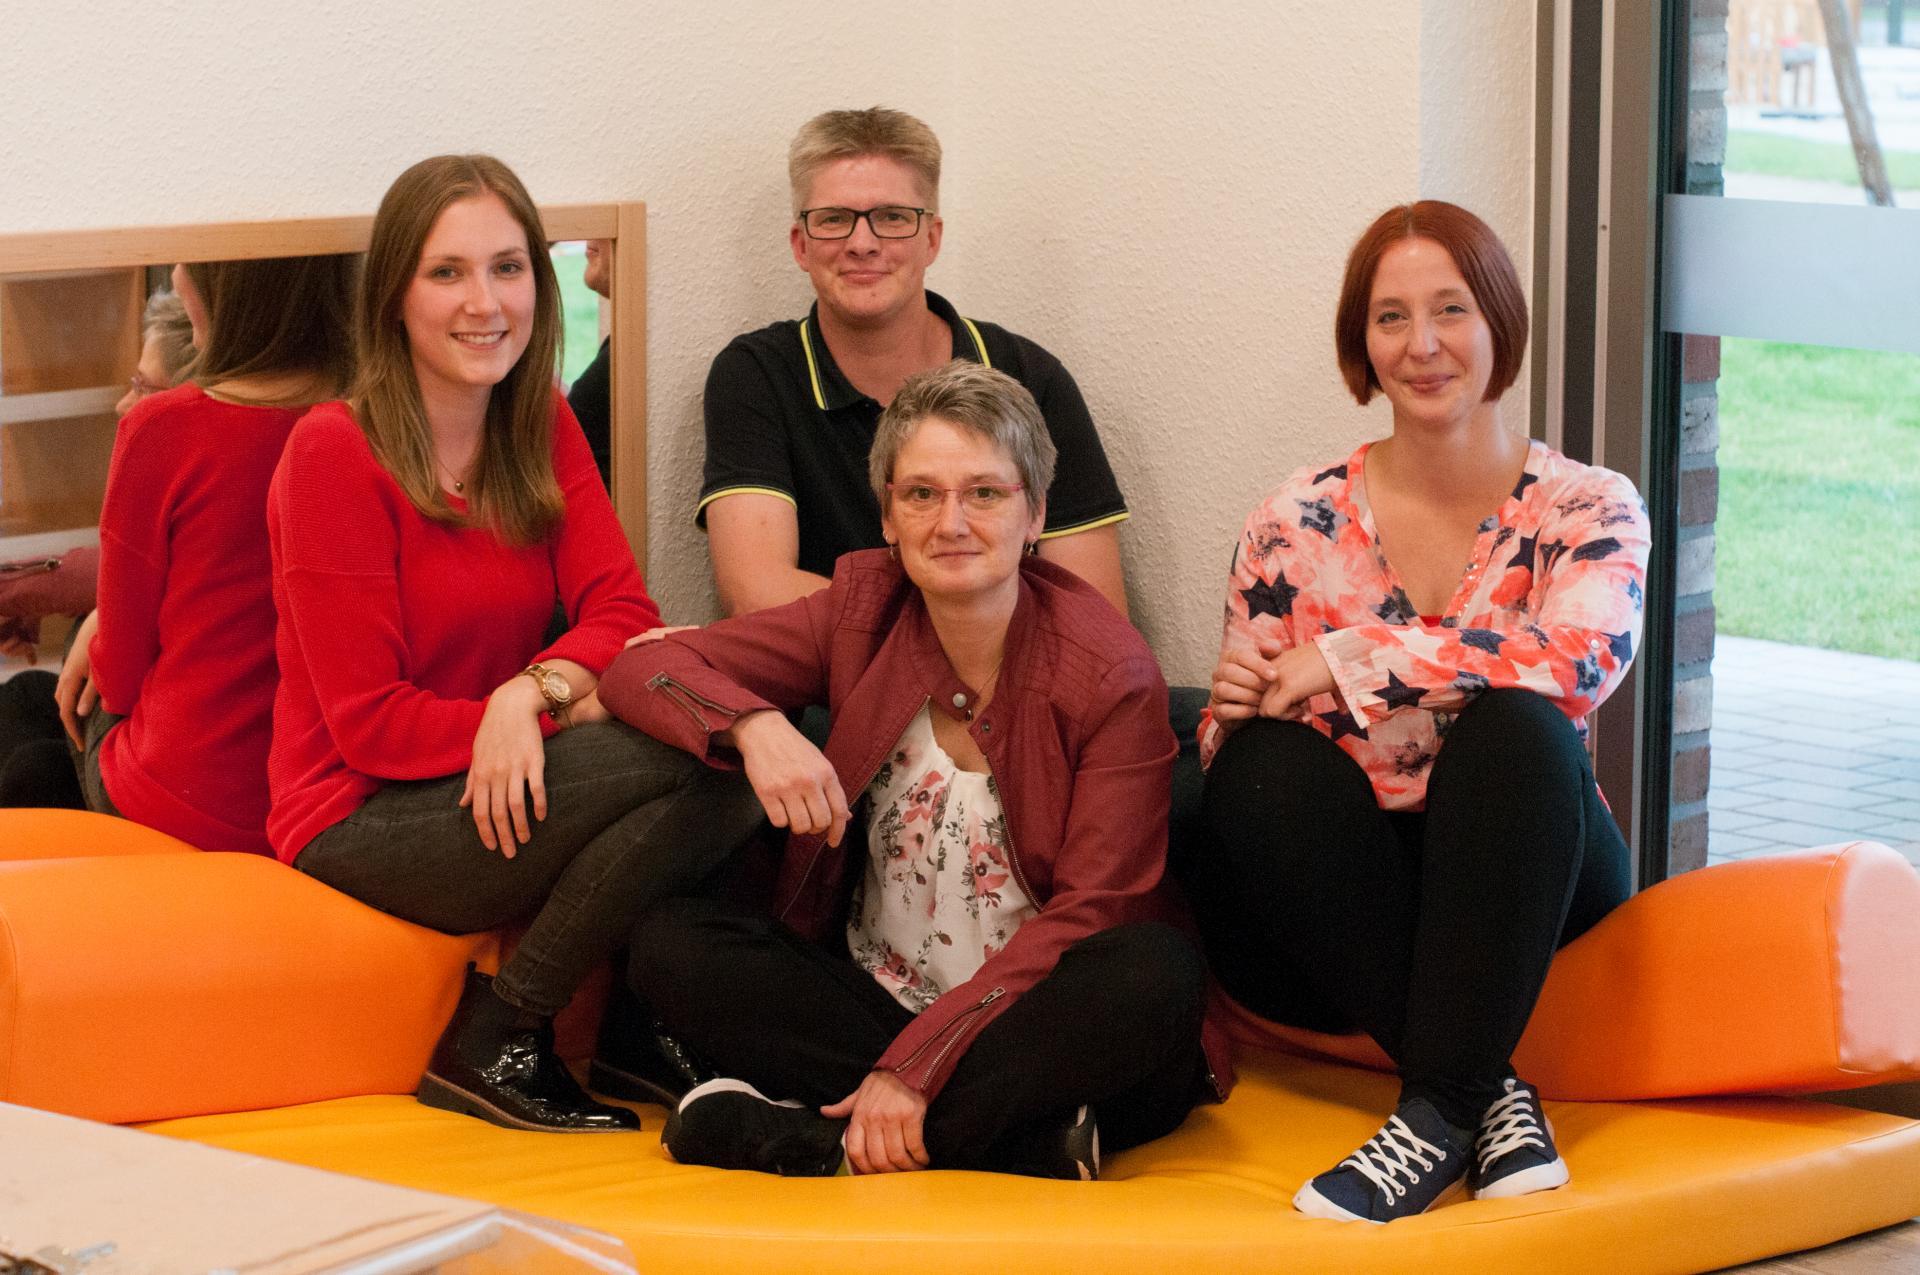 Leuchtturnmgruppe, v.l. Franziska Henke, Johannes Stadtsholte, Sarah Claus, vorne Conny Bullermann